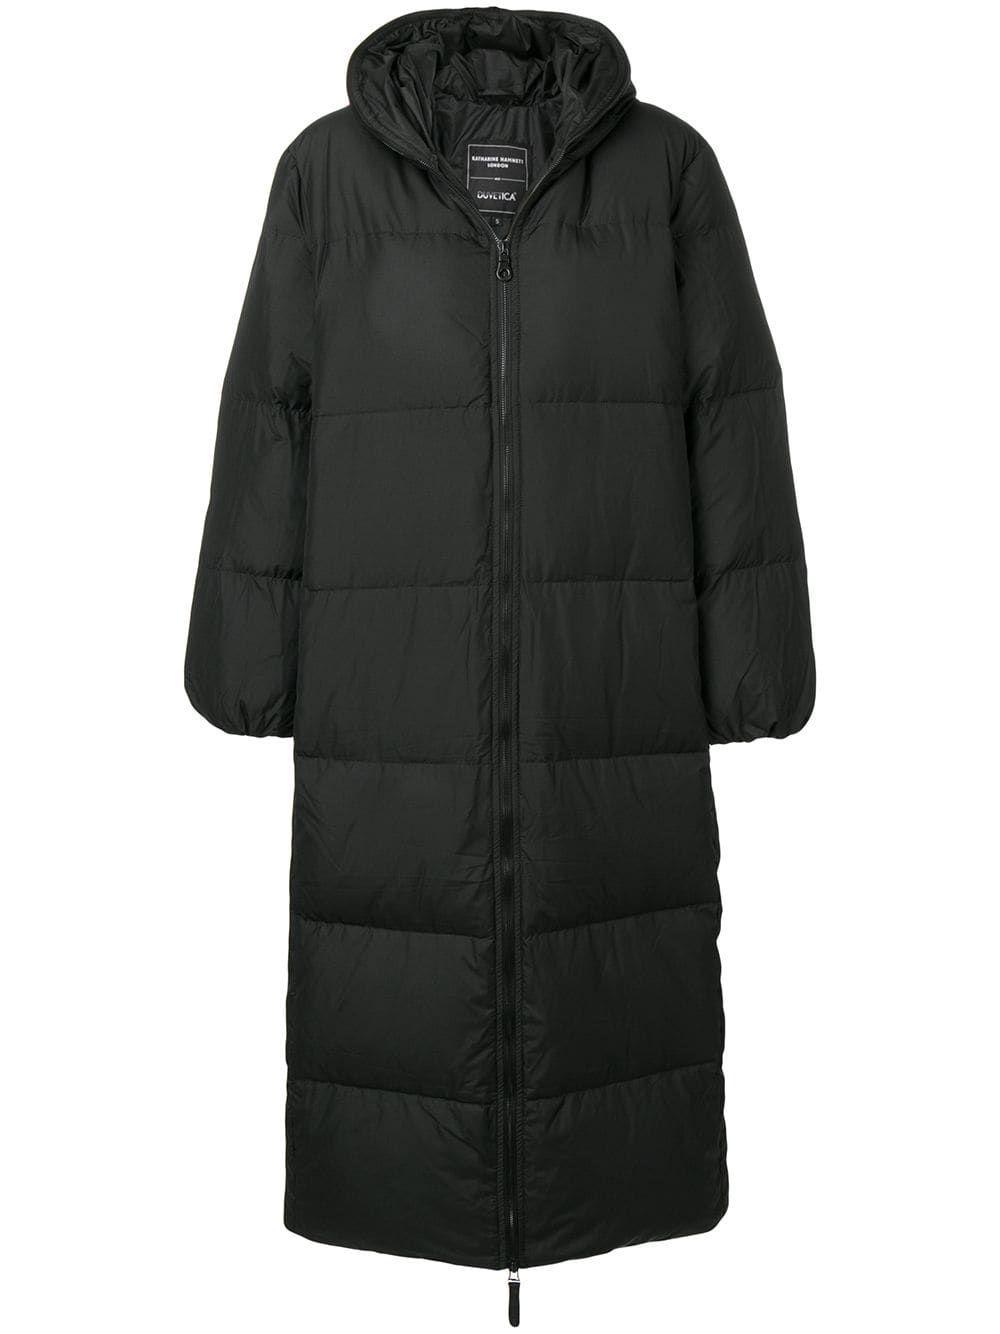 Duvetica Love Puffer Coat Farfetch Puffer Coat Coat Coat Design [ 1334 x 1000 Pixel ]